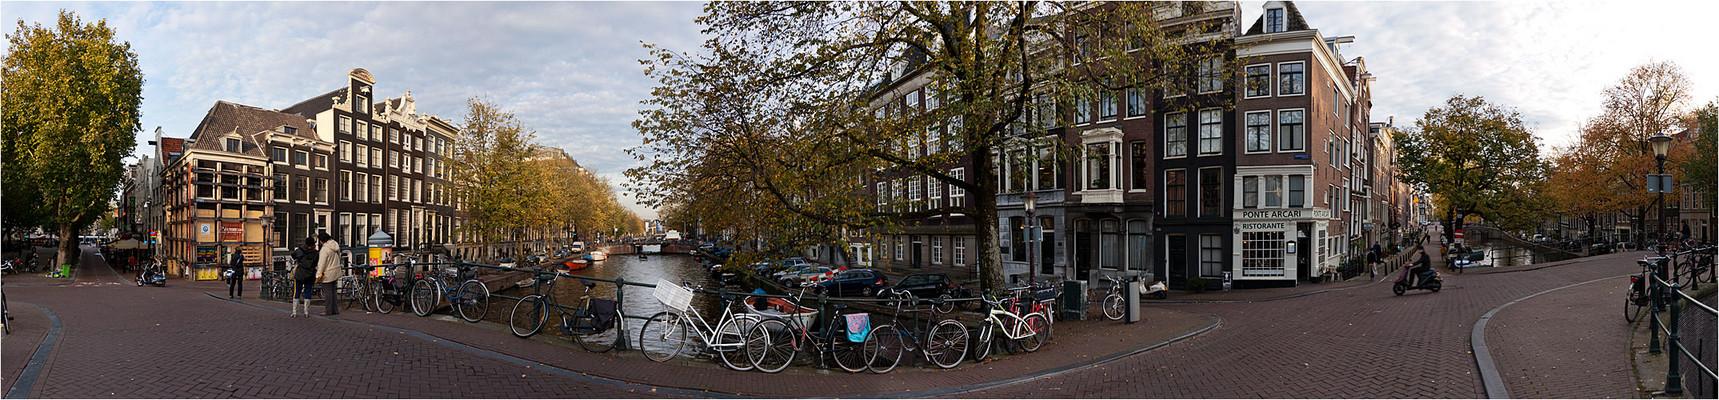 Amsterdam 11 12